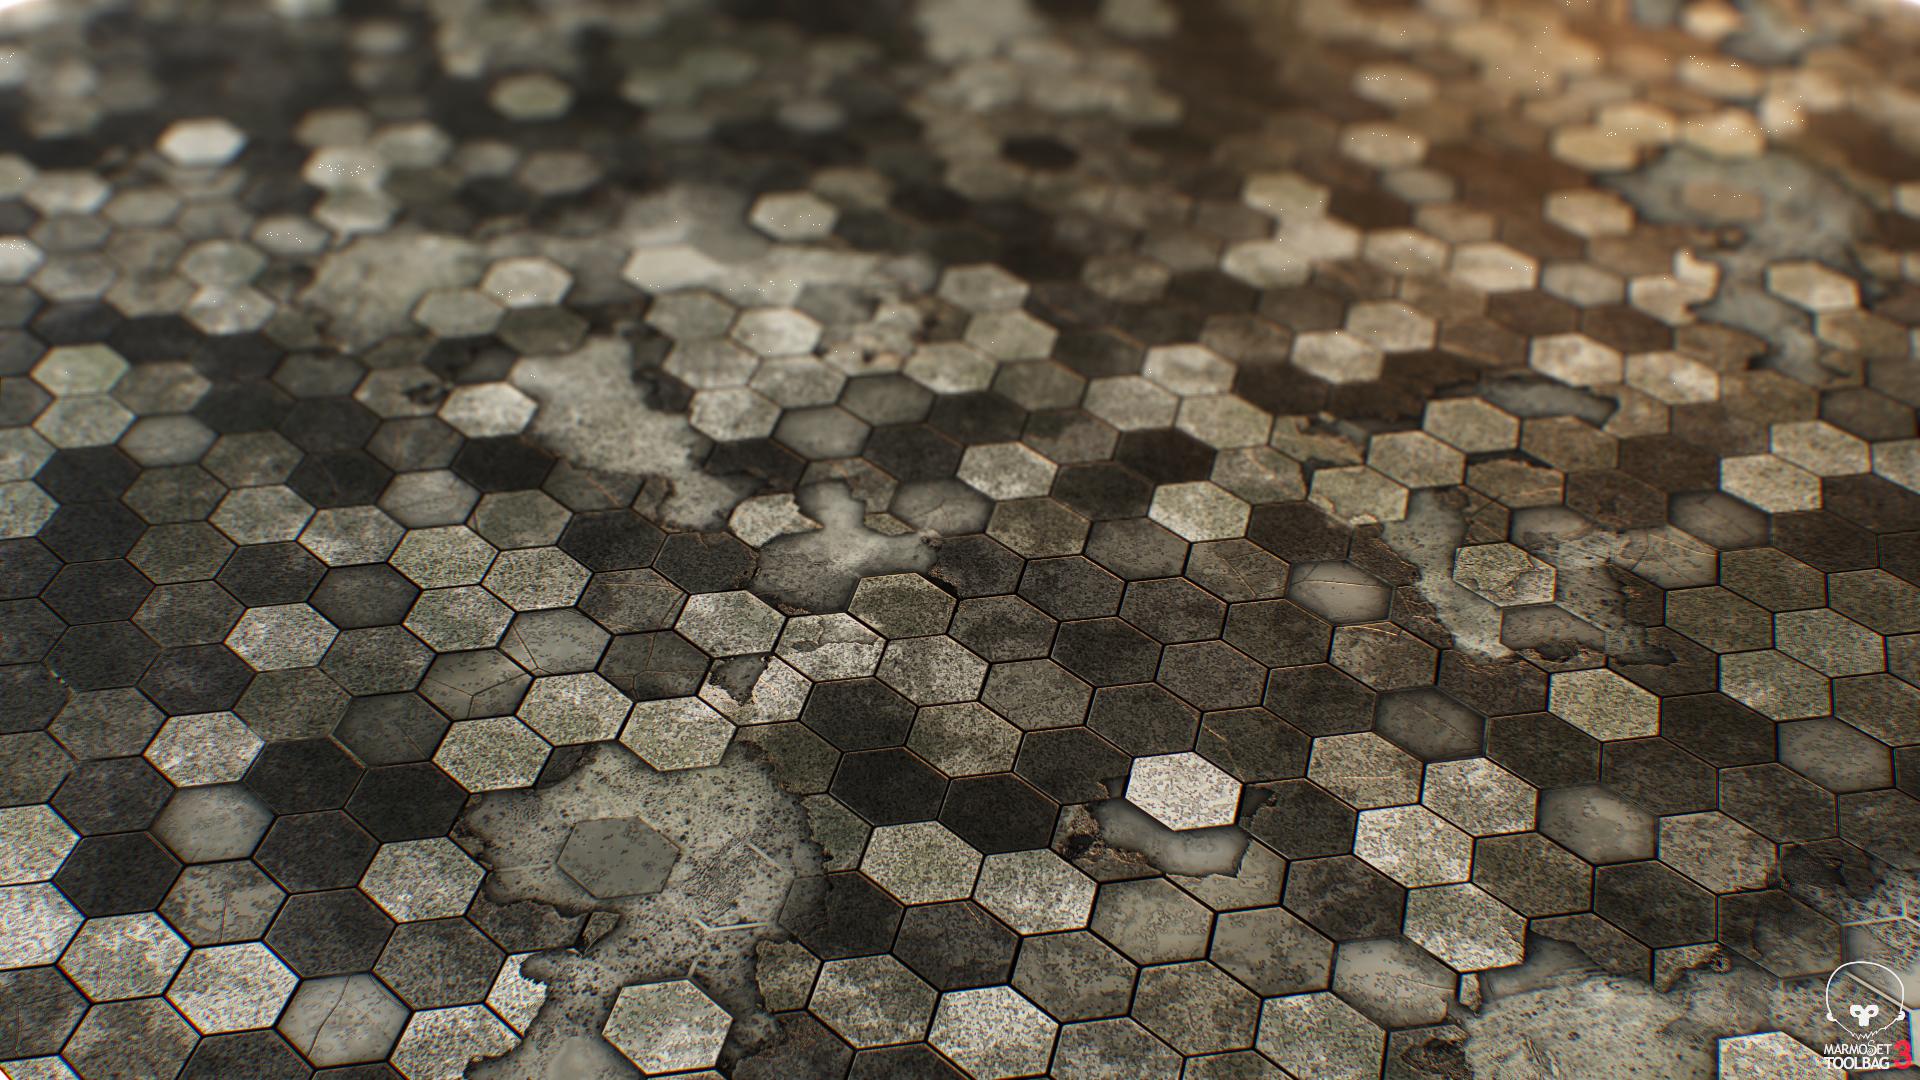 CeramicTiles_Cracked_01_Applied.jpg